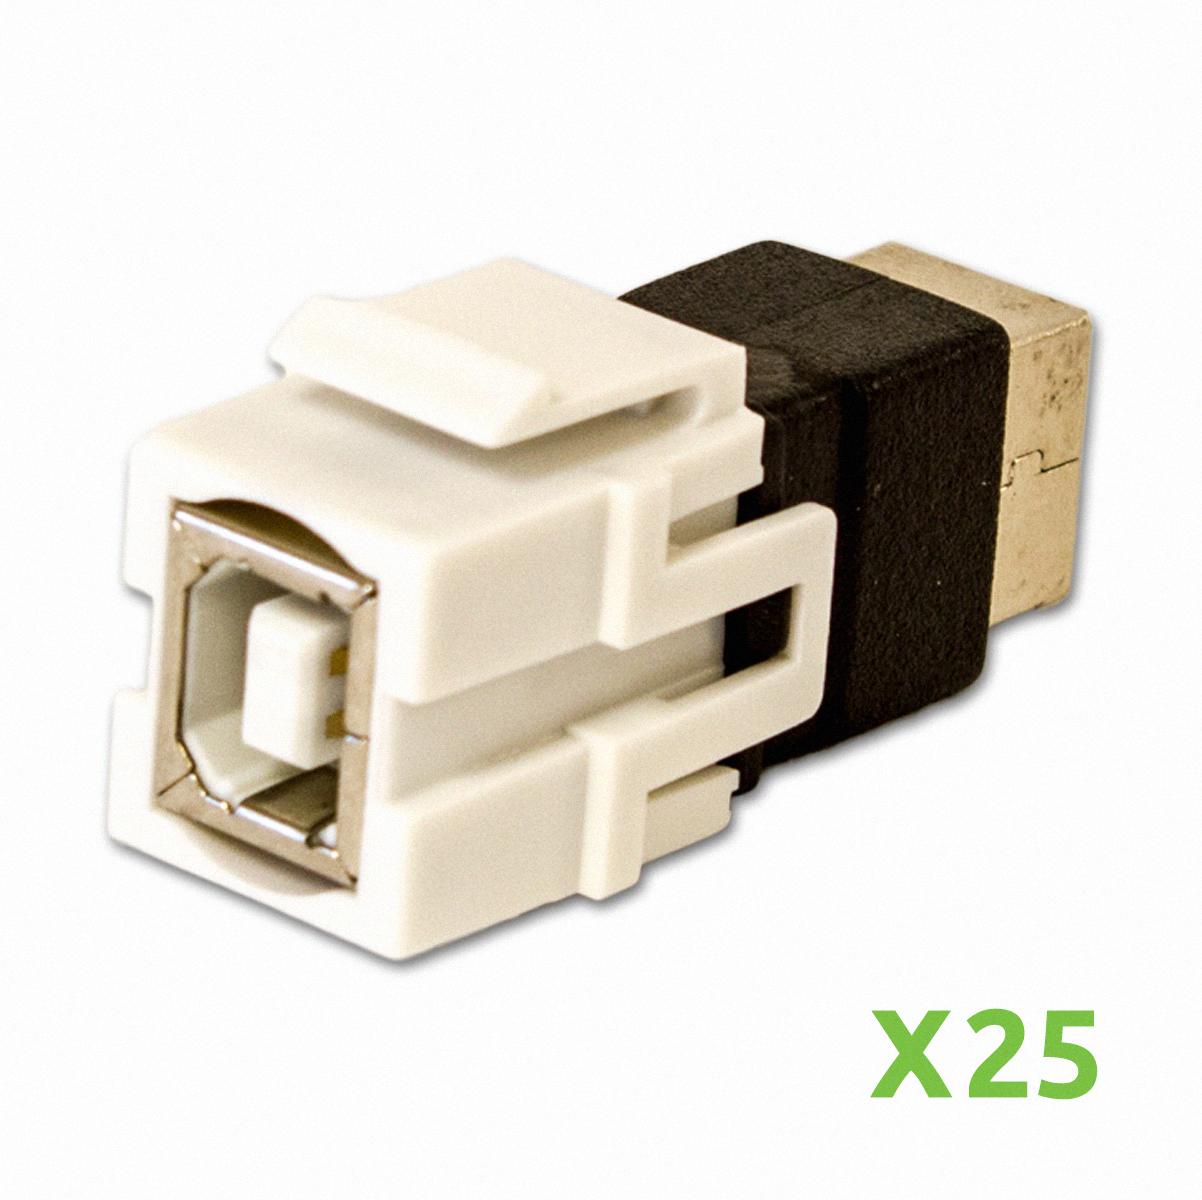 NavePoint USB 2.0 B Female to Female Keystone Adapter Whi...